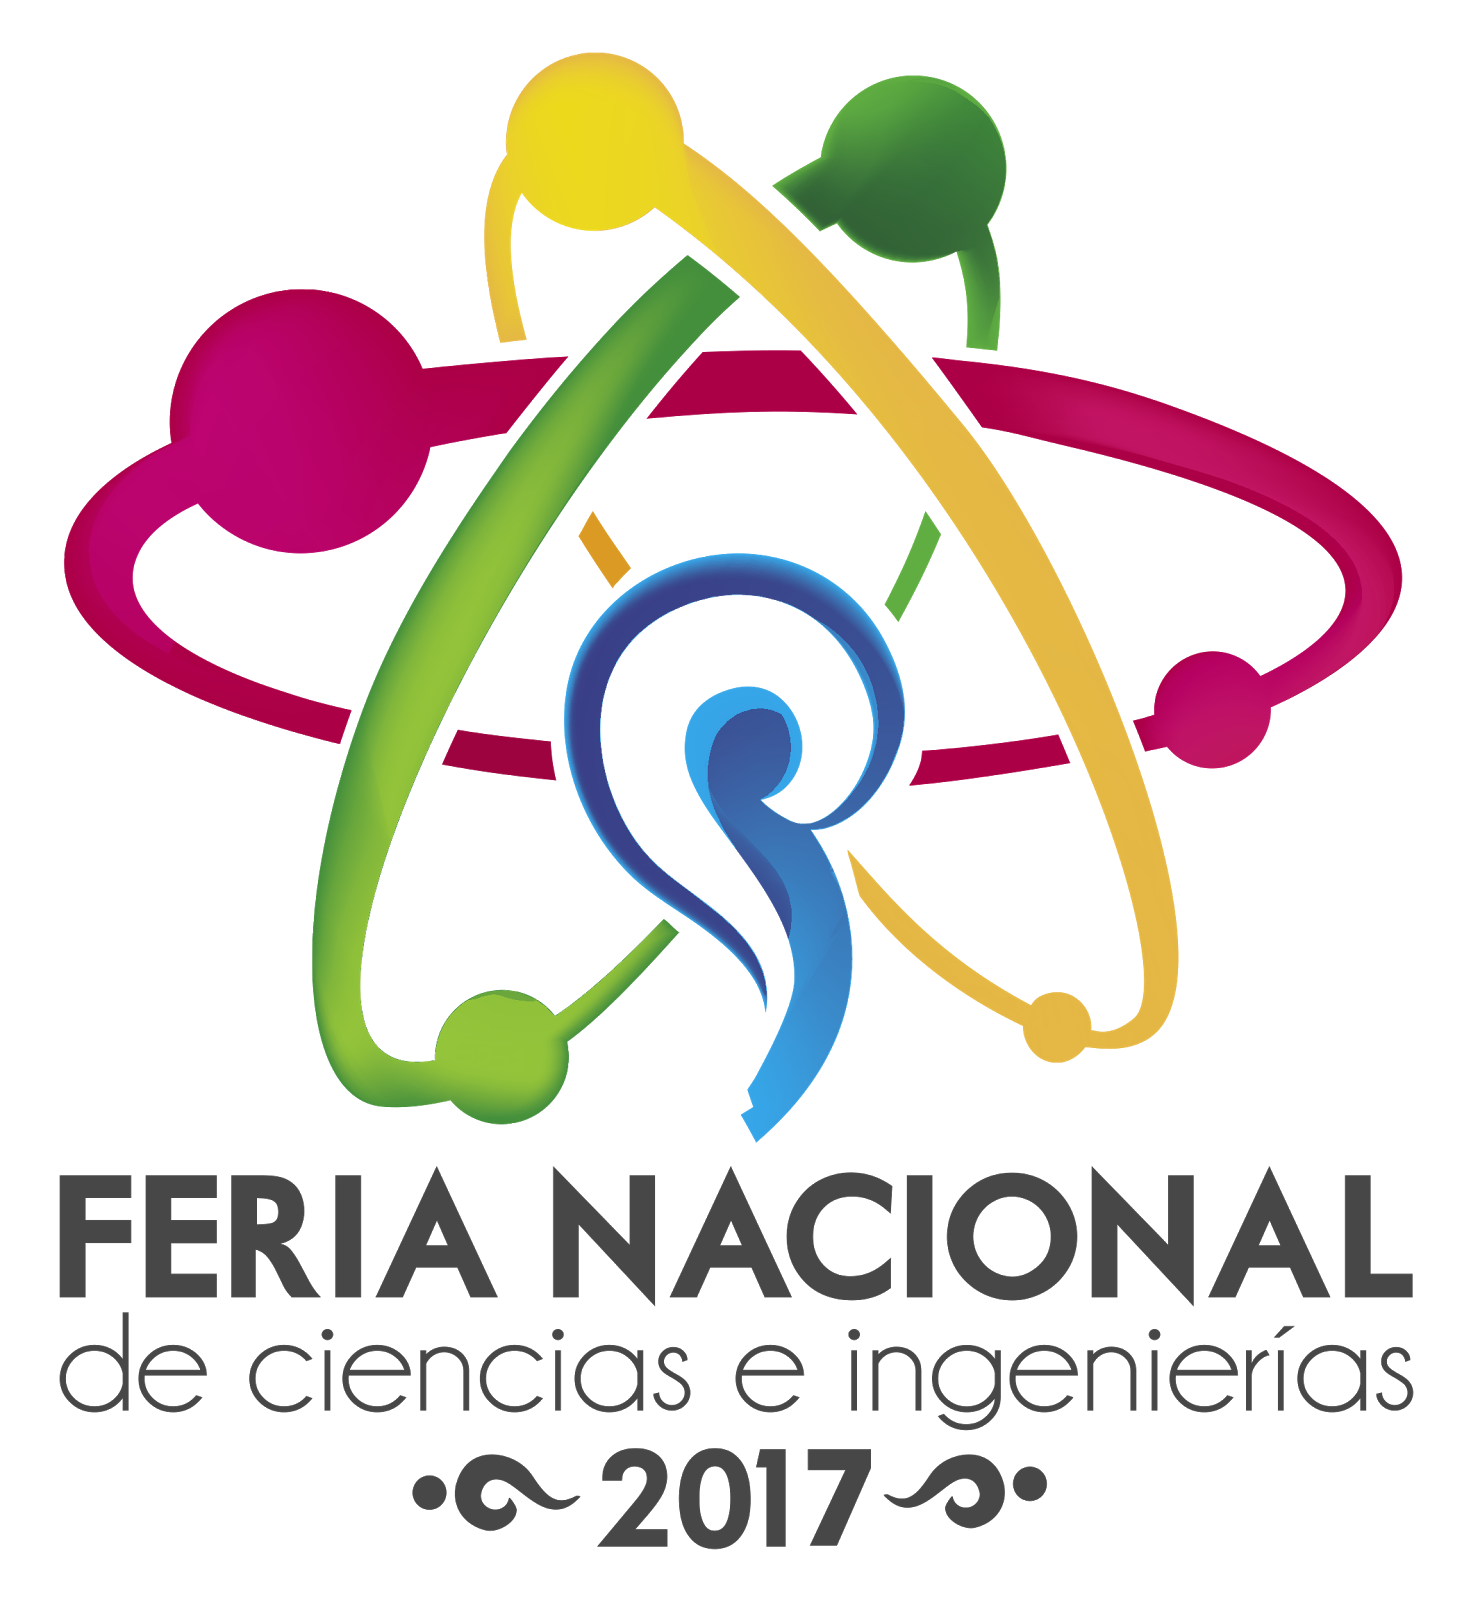 Feria Nacional de Ciencias e Ingenierías 2017